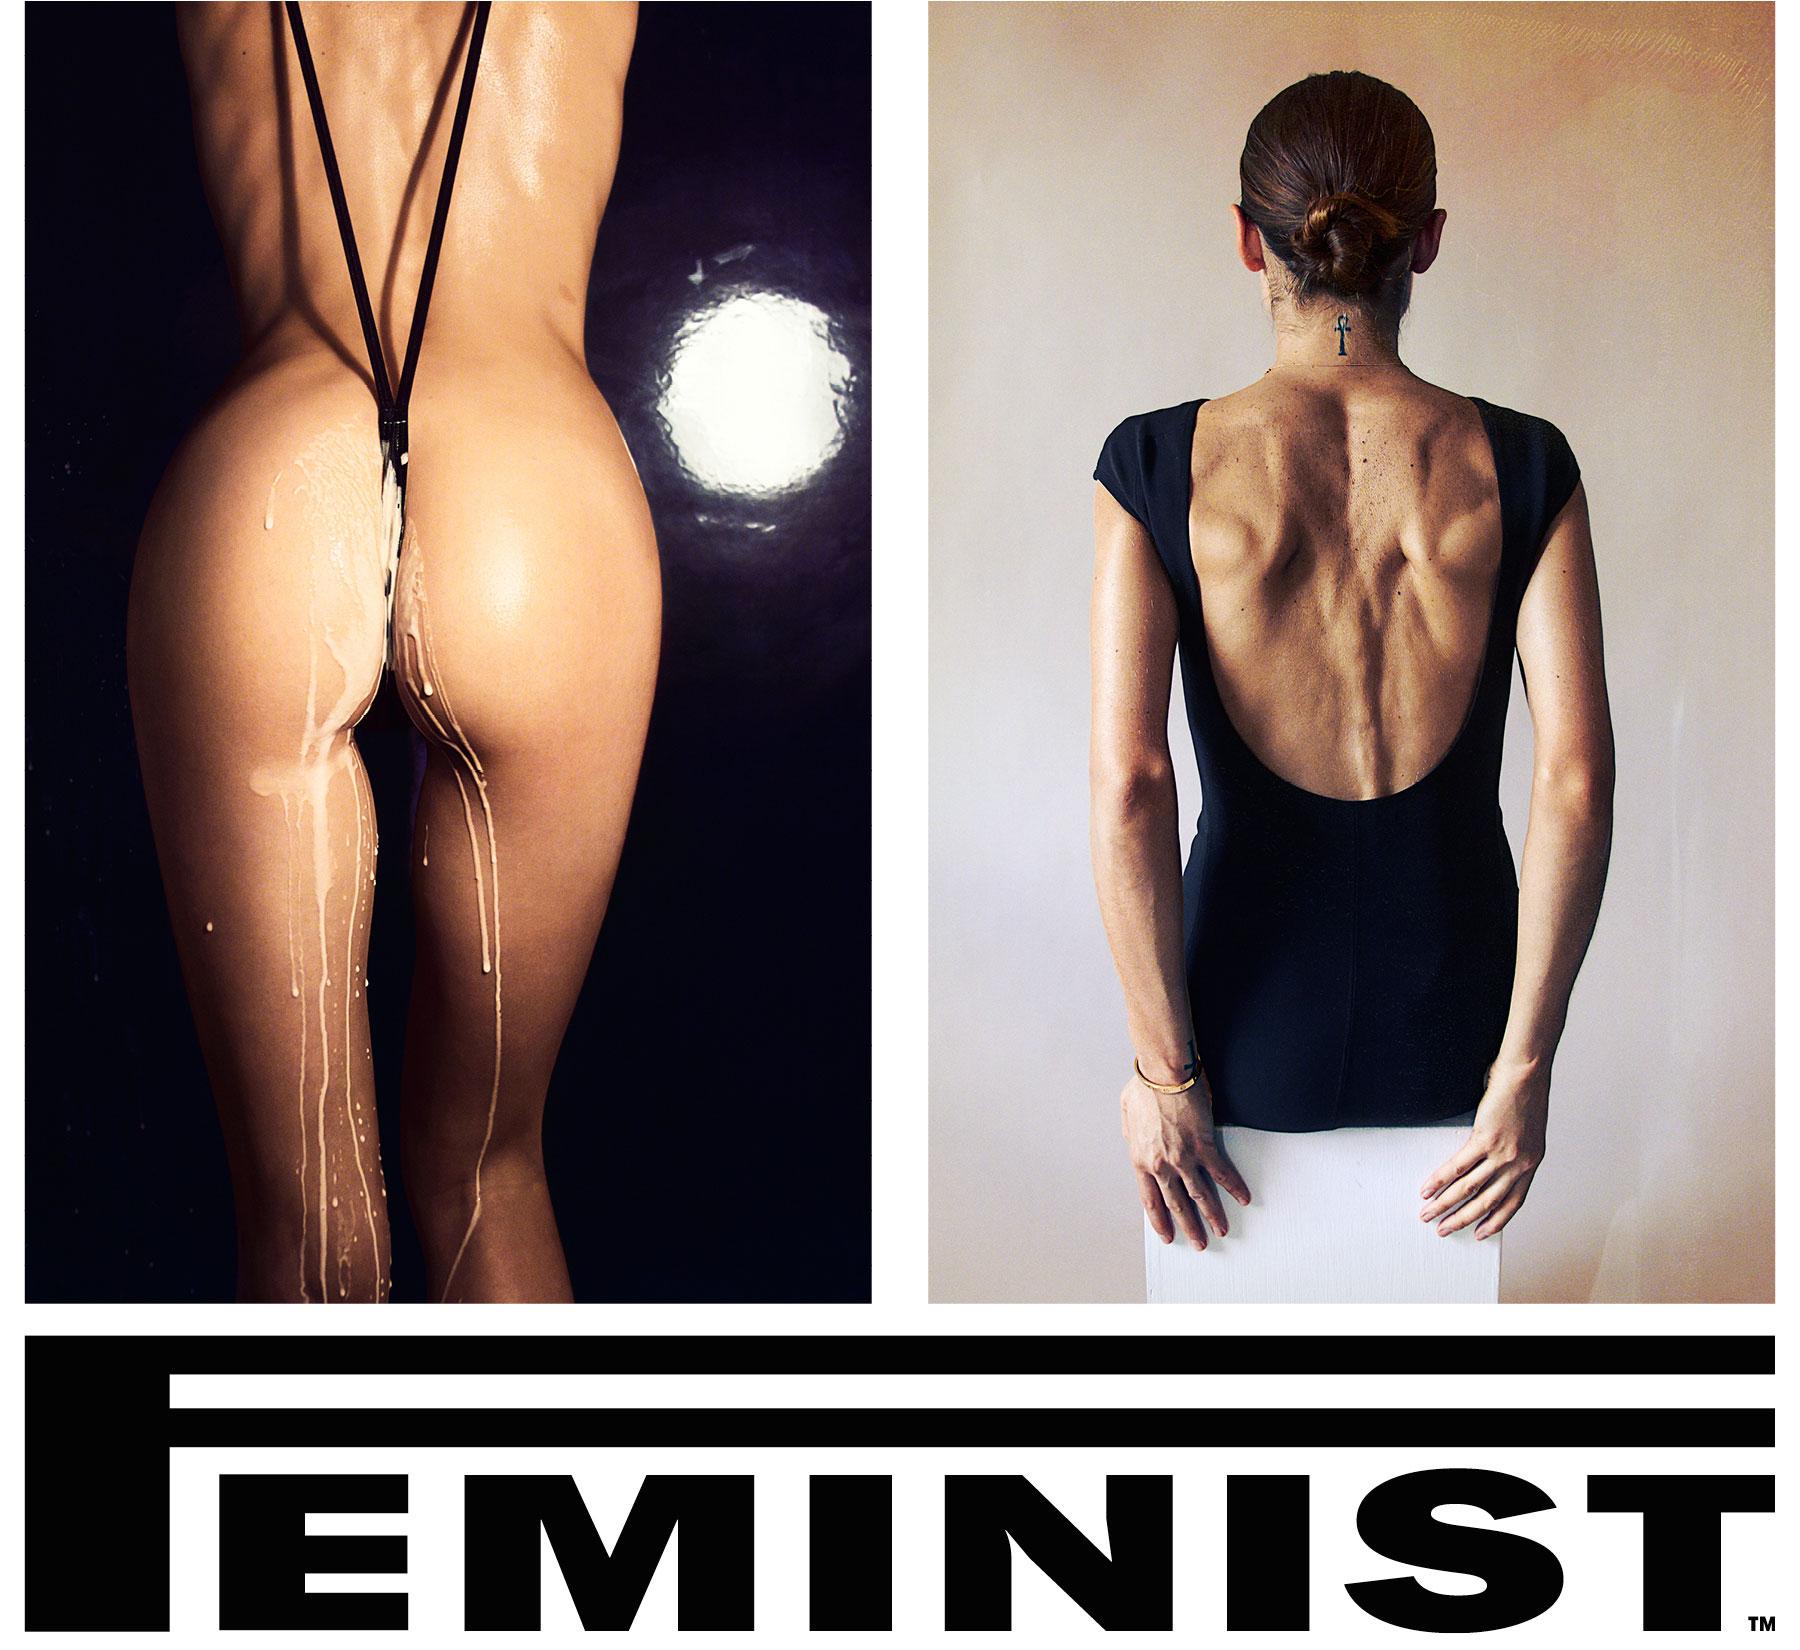 THE_FEMINIST_CALENDAR_2016